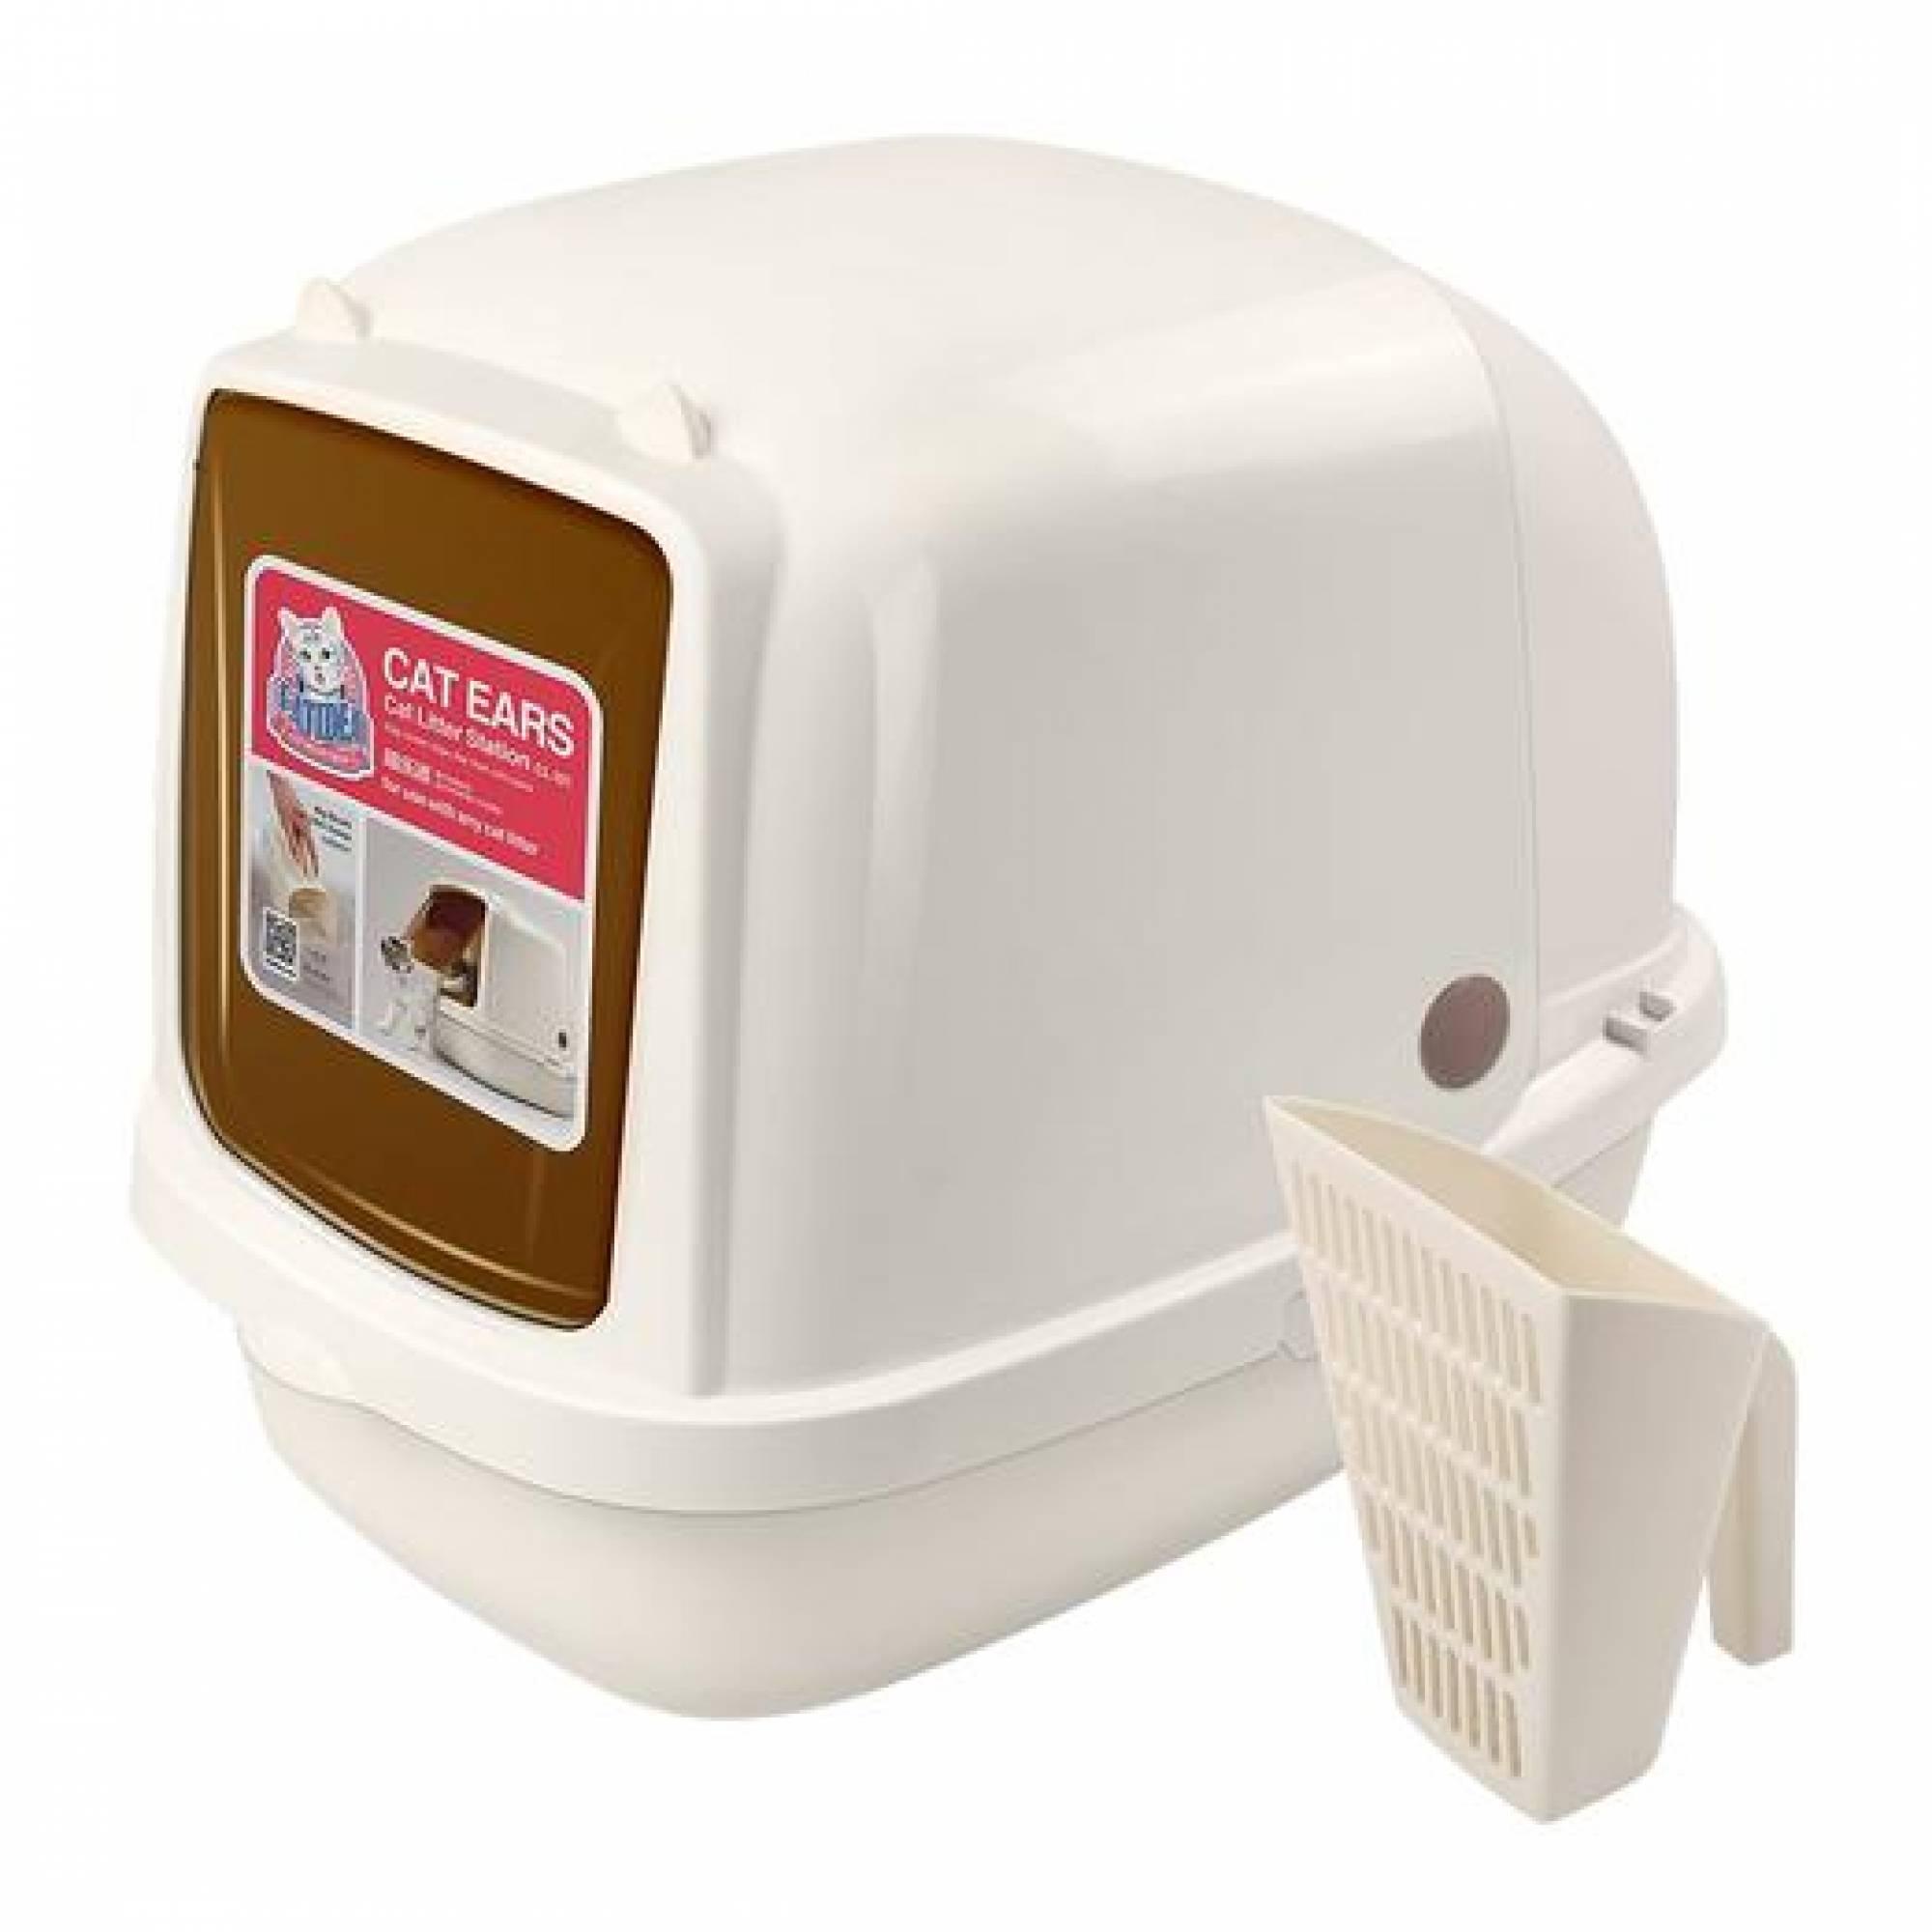 CATIDEA - CL101 Cat Ear Litter Box (Cream) - Size L